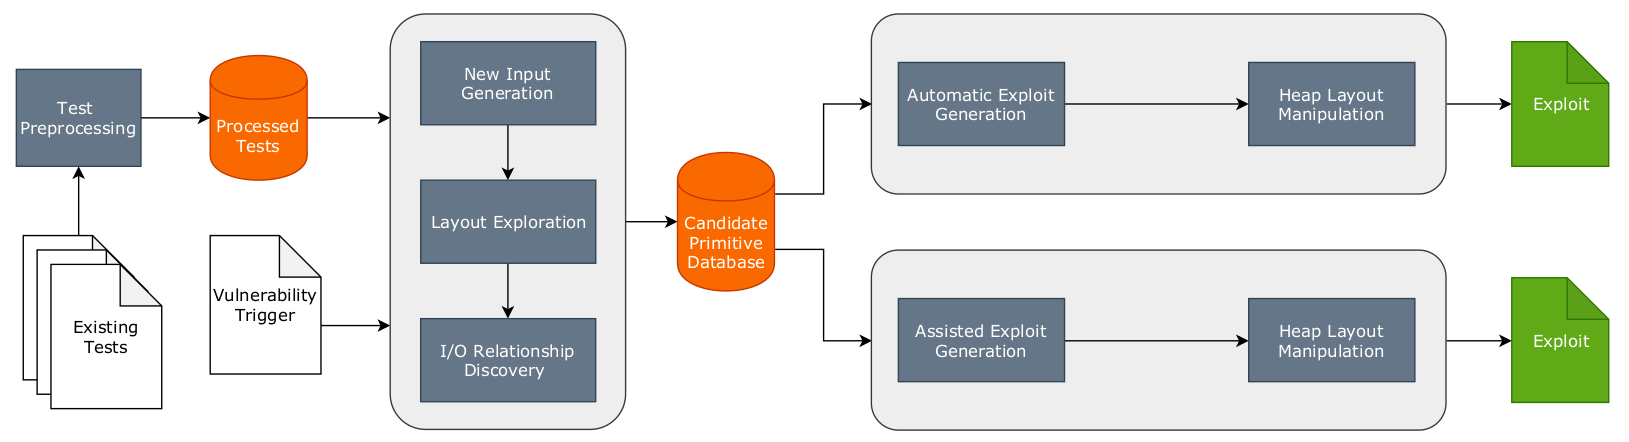 Workflow diagram for Gollum